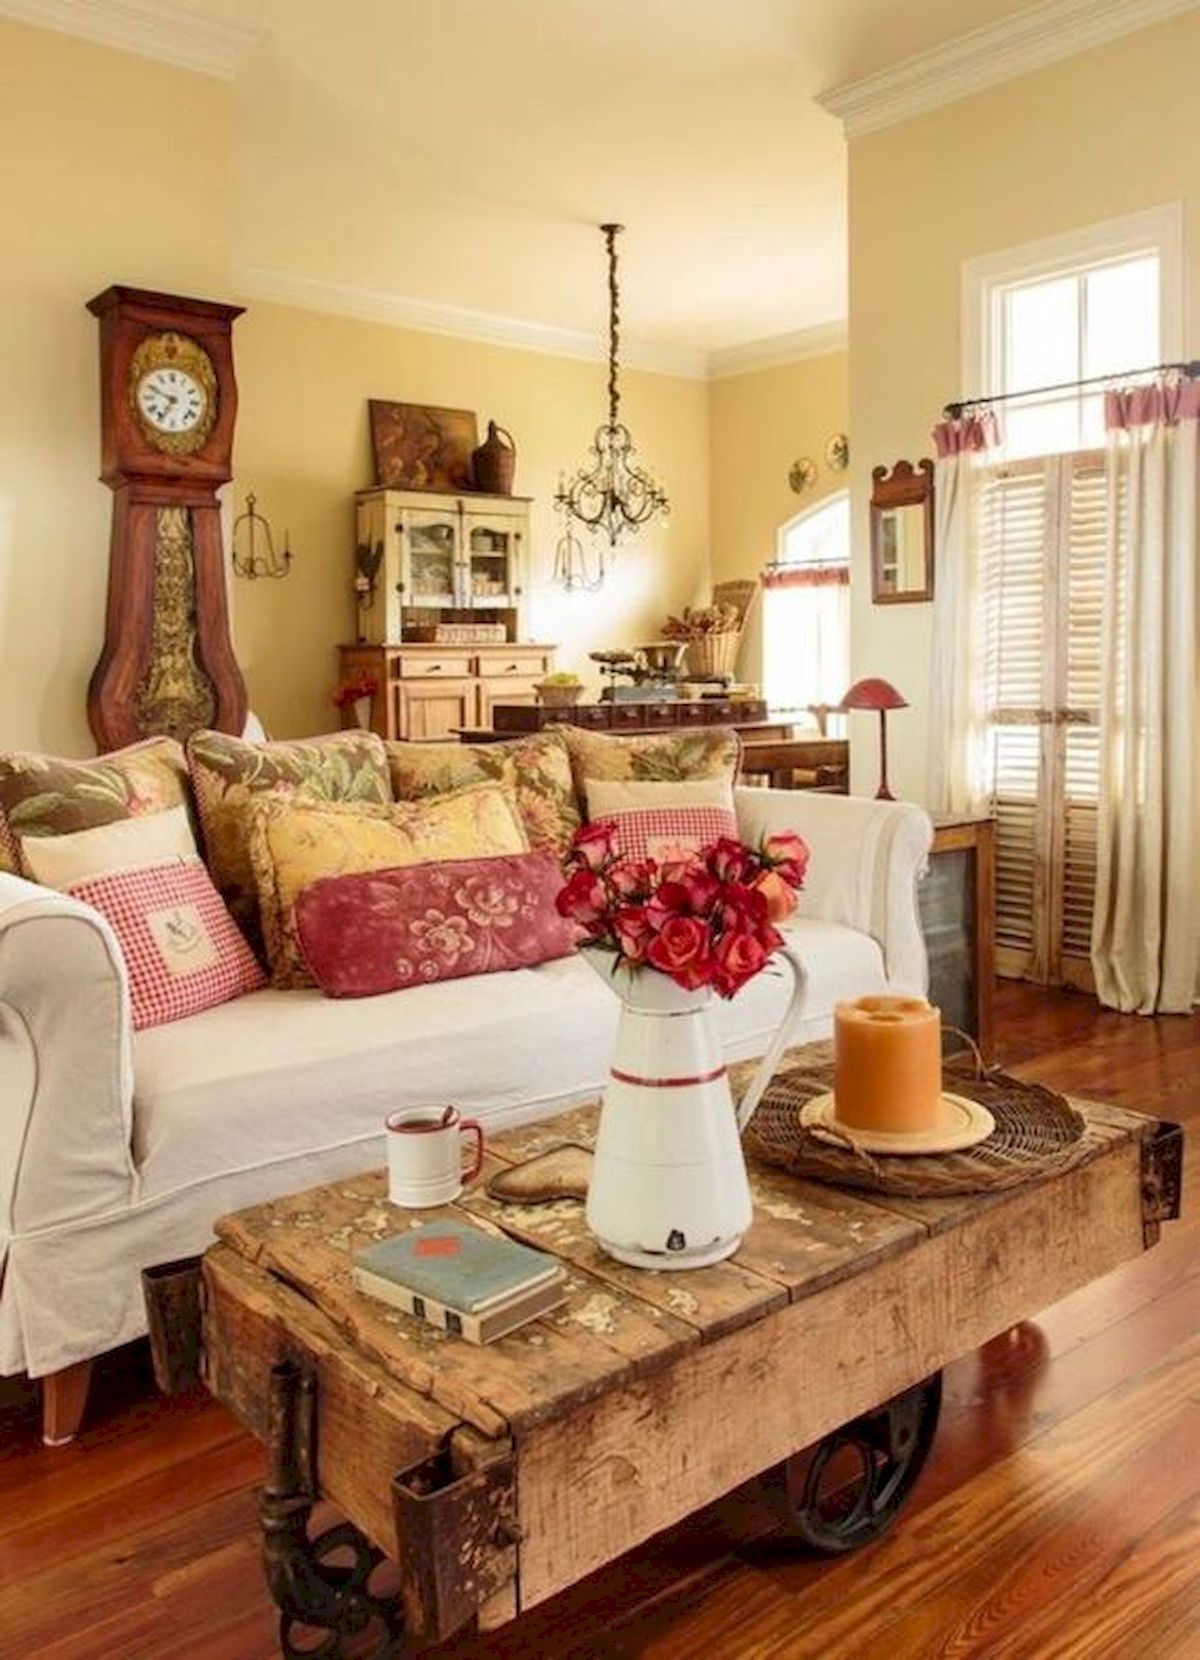 Adorable 12 Best Furniture For Modern Farmhouse Living Room Decor ...